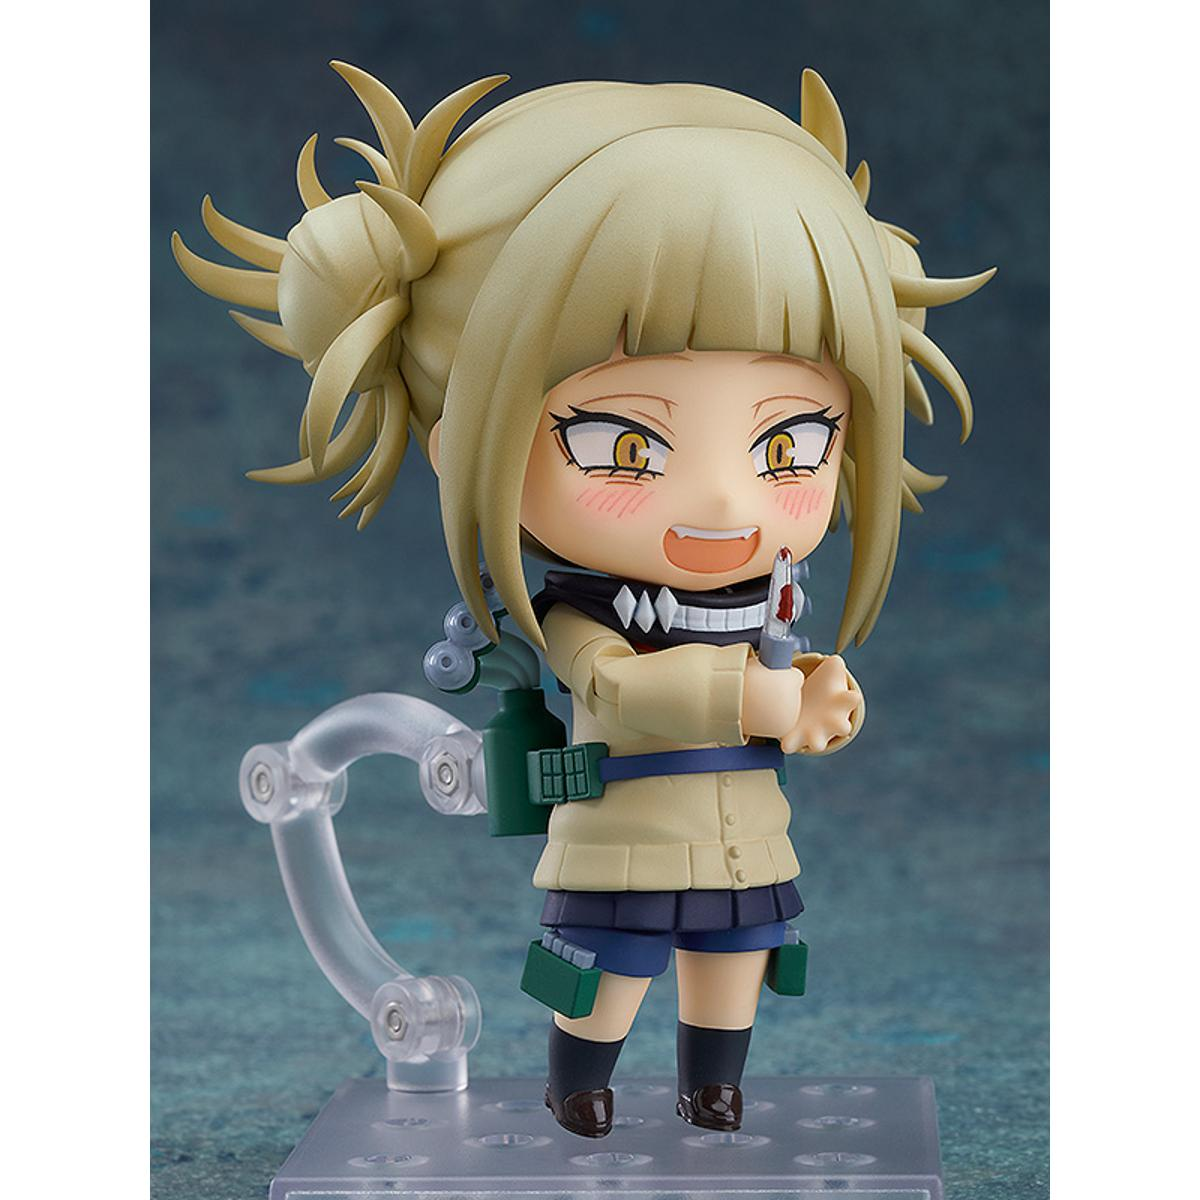 EC Good Smile Nendoroid My Hero Boku no Hero Academia Figure Himiko Toga